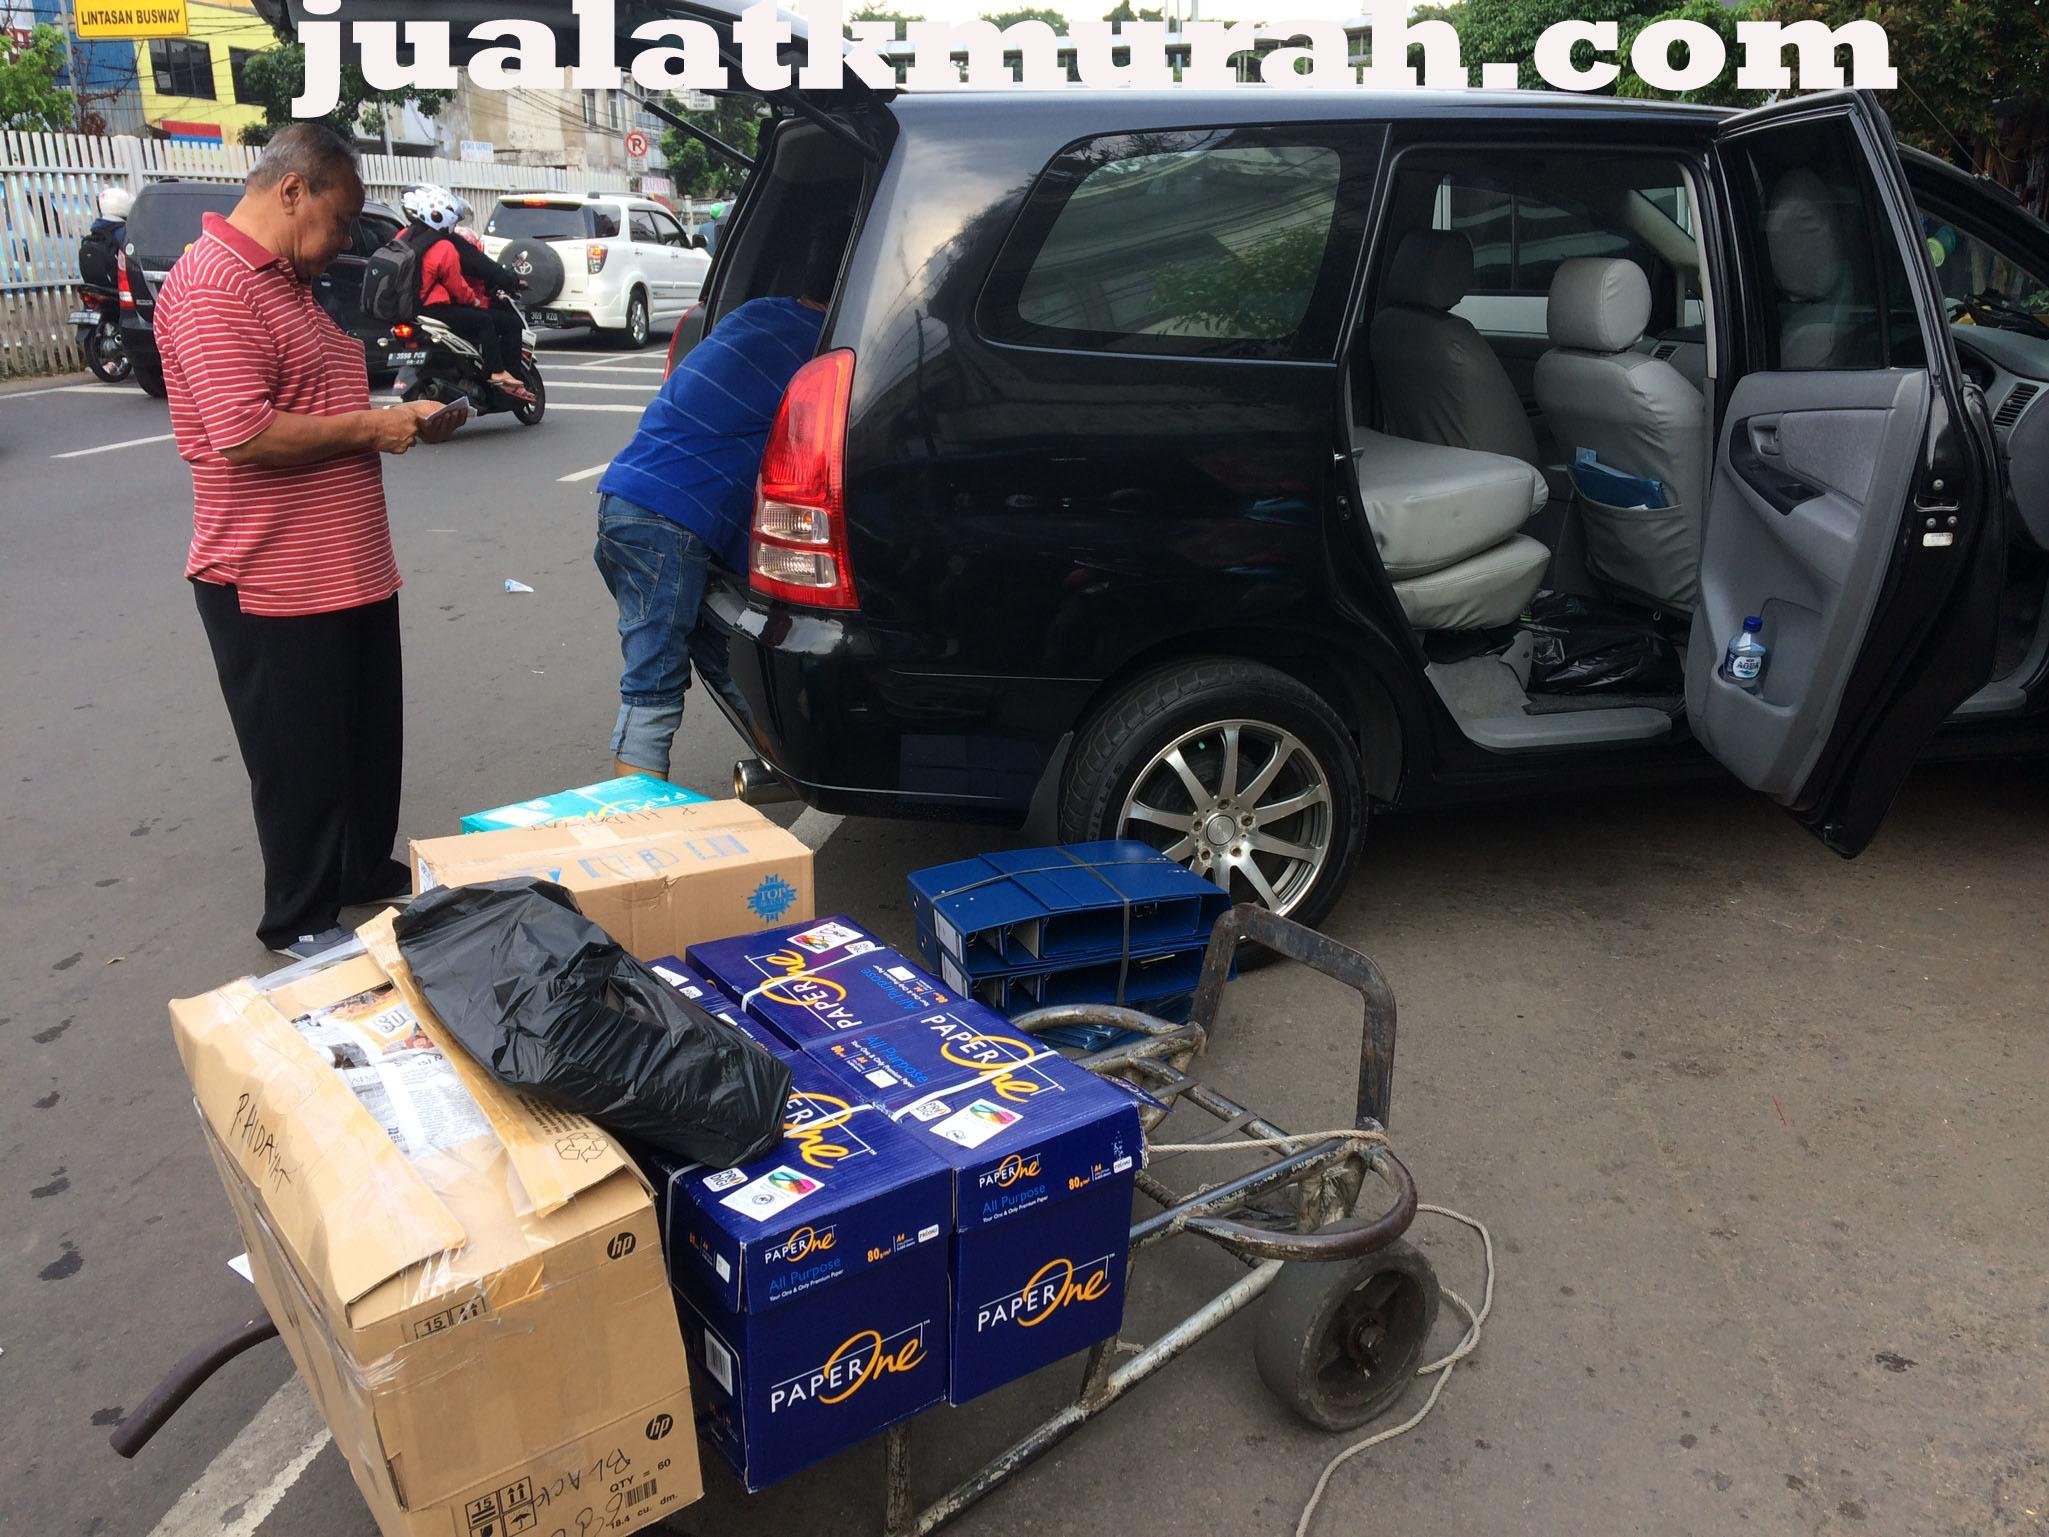 Jual ATK Murah di Bangka Jakarta Selatan